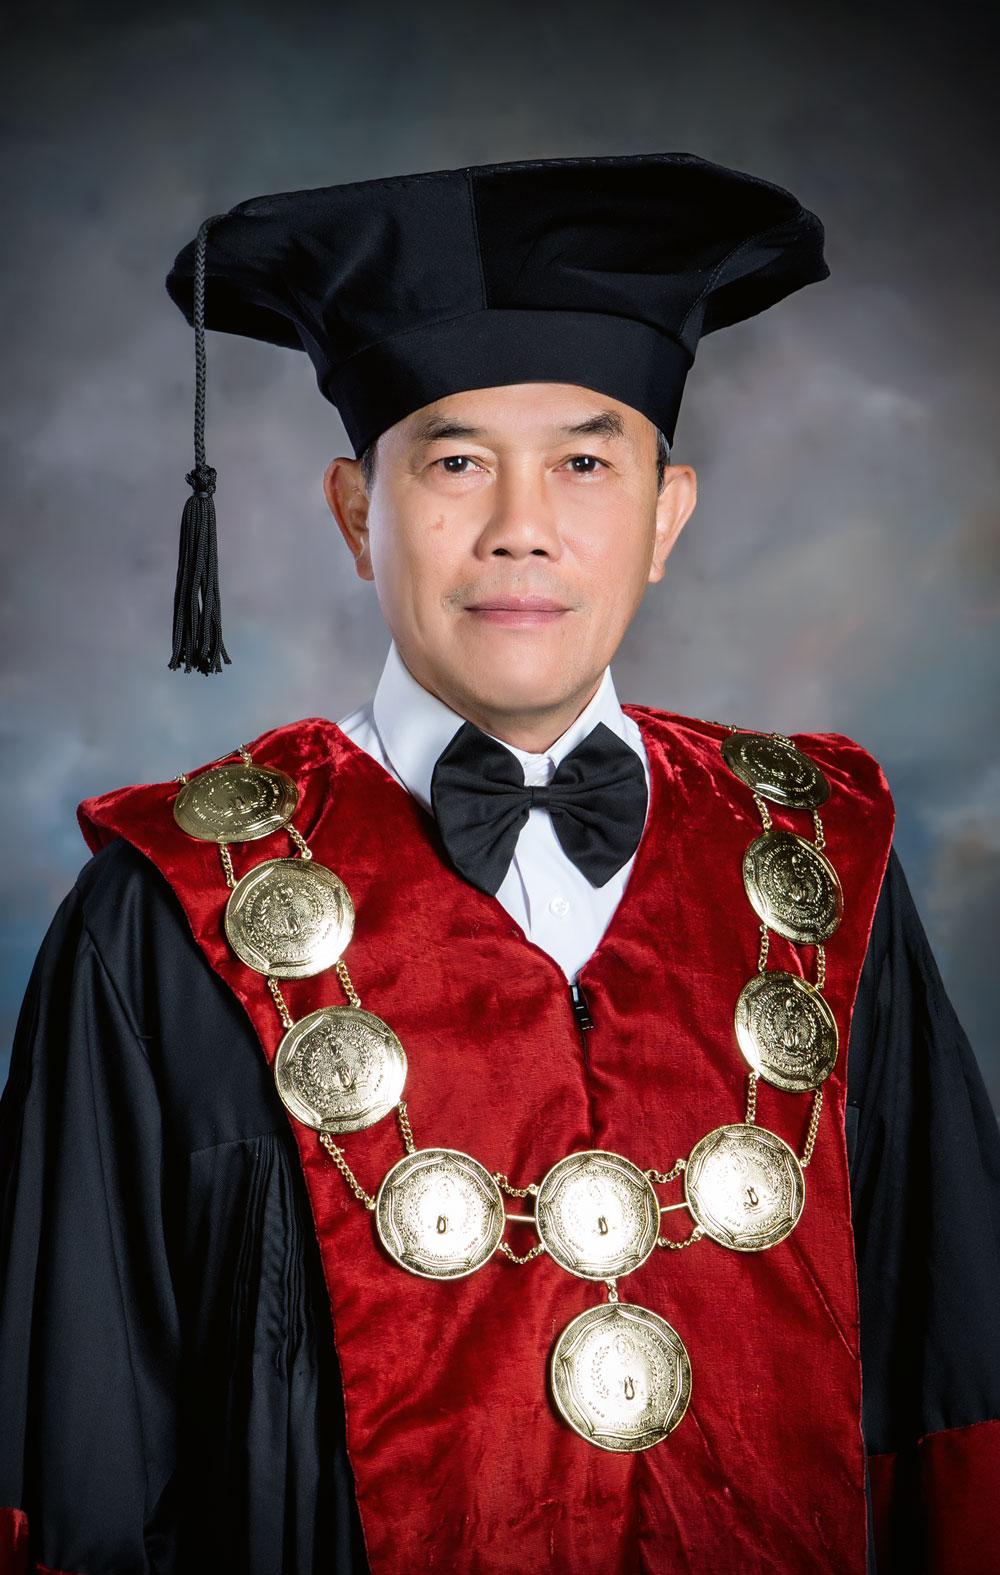 Sambutan Rektor Universitas Jenderal Achmad Yani Yogyakarta